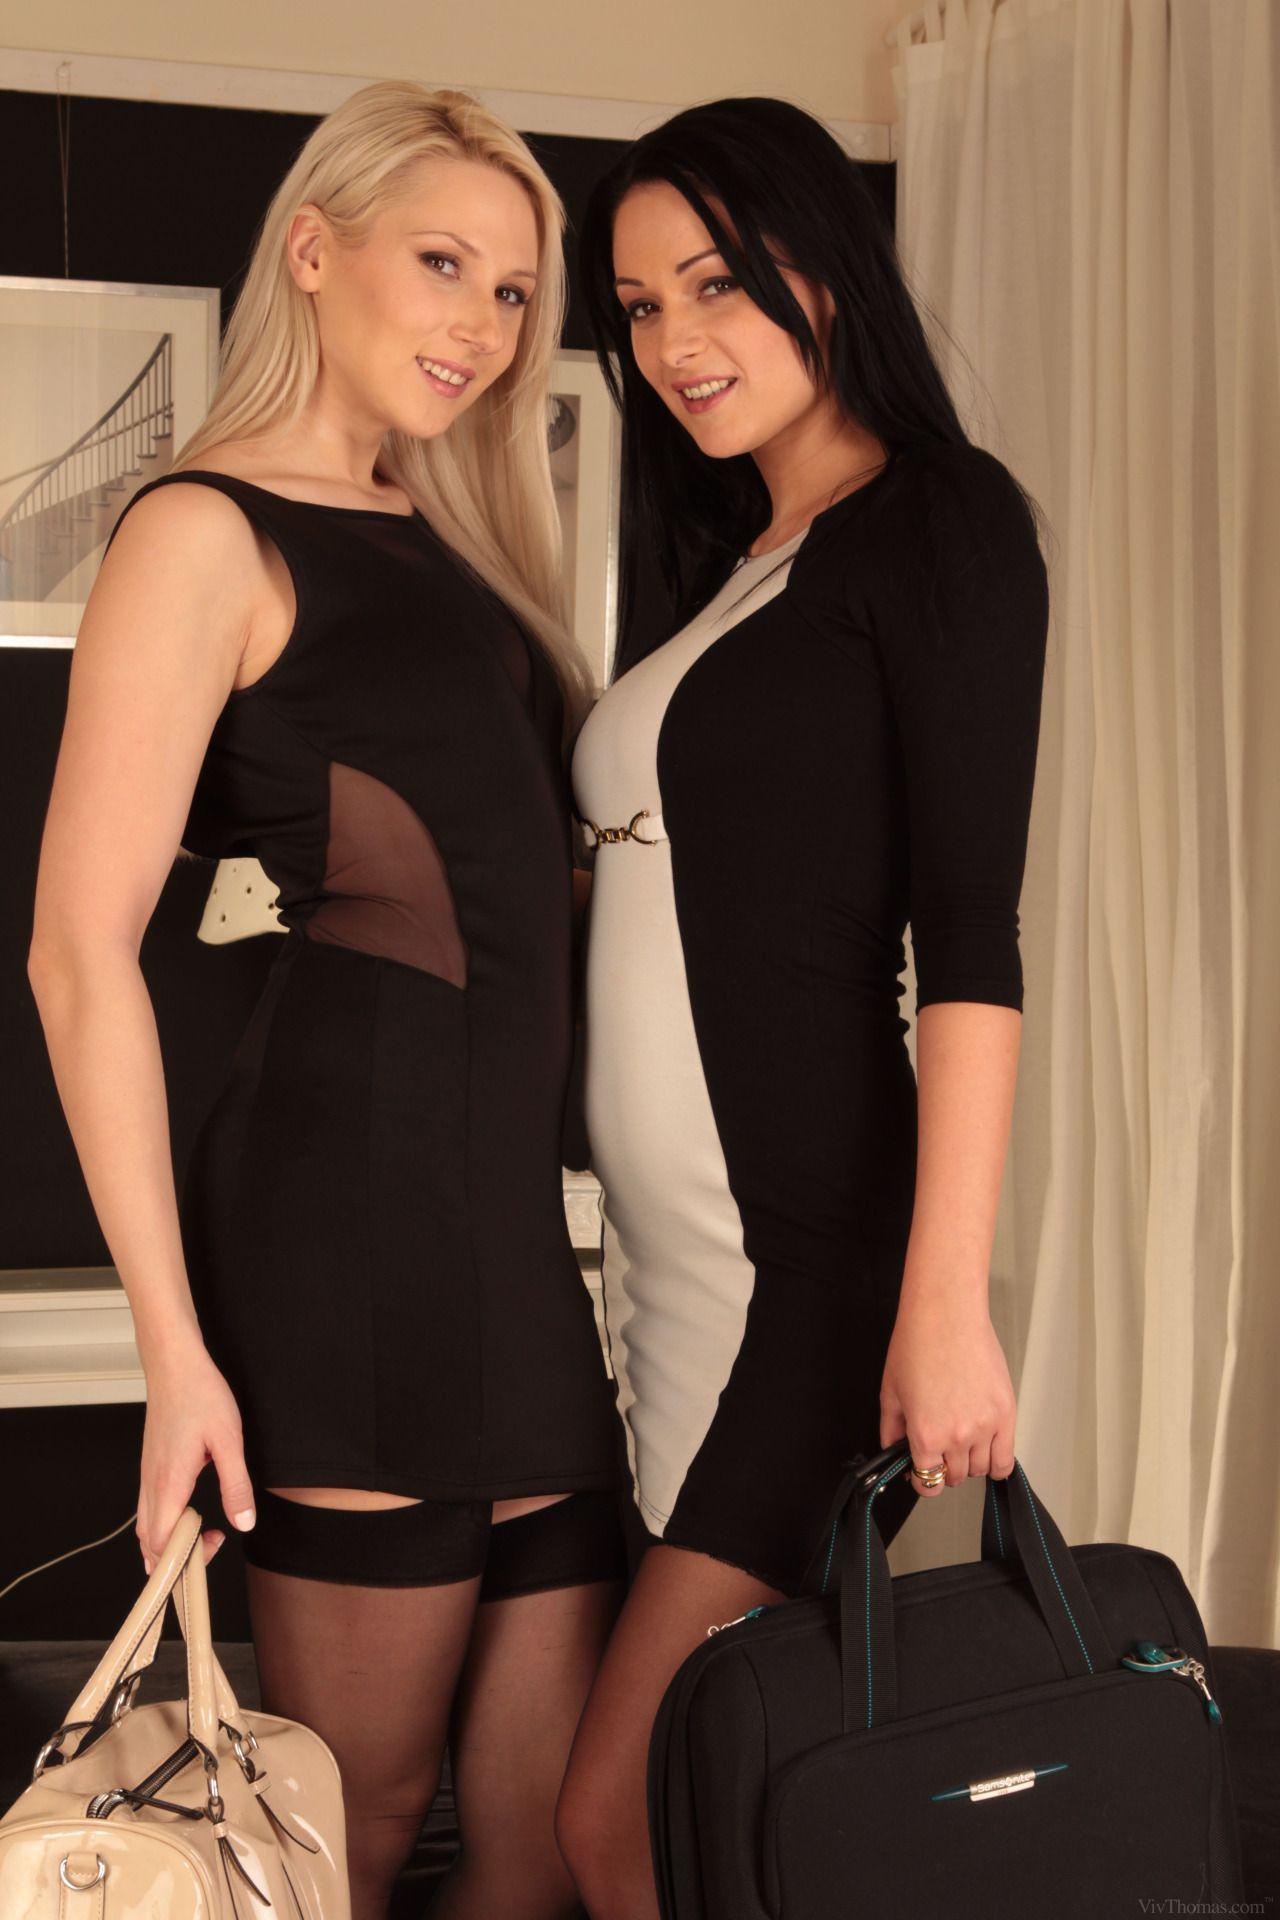 Lesbians Stockings 90